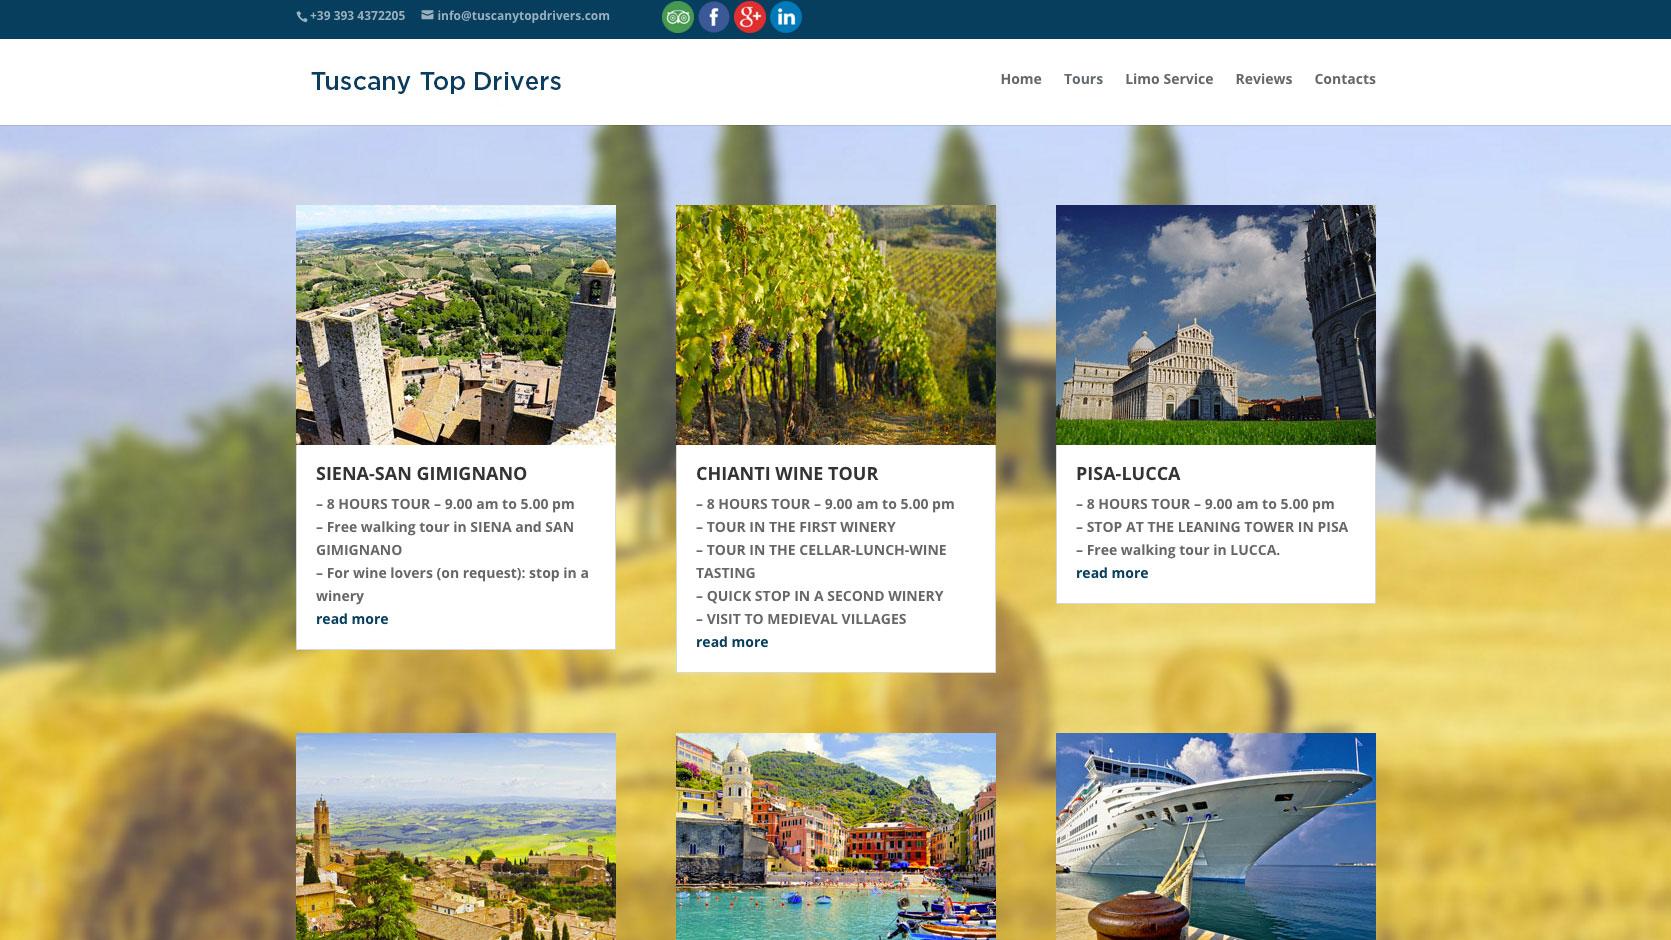 Tuscany Top Drivers Homepage